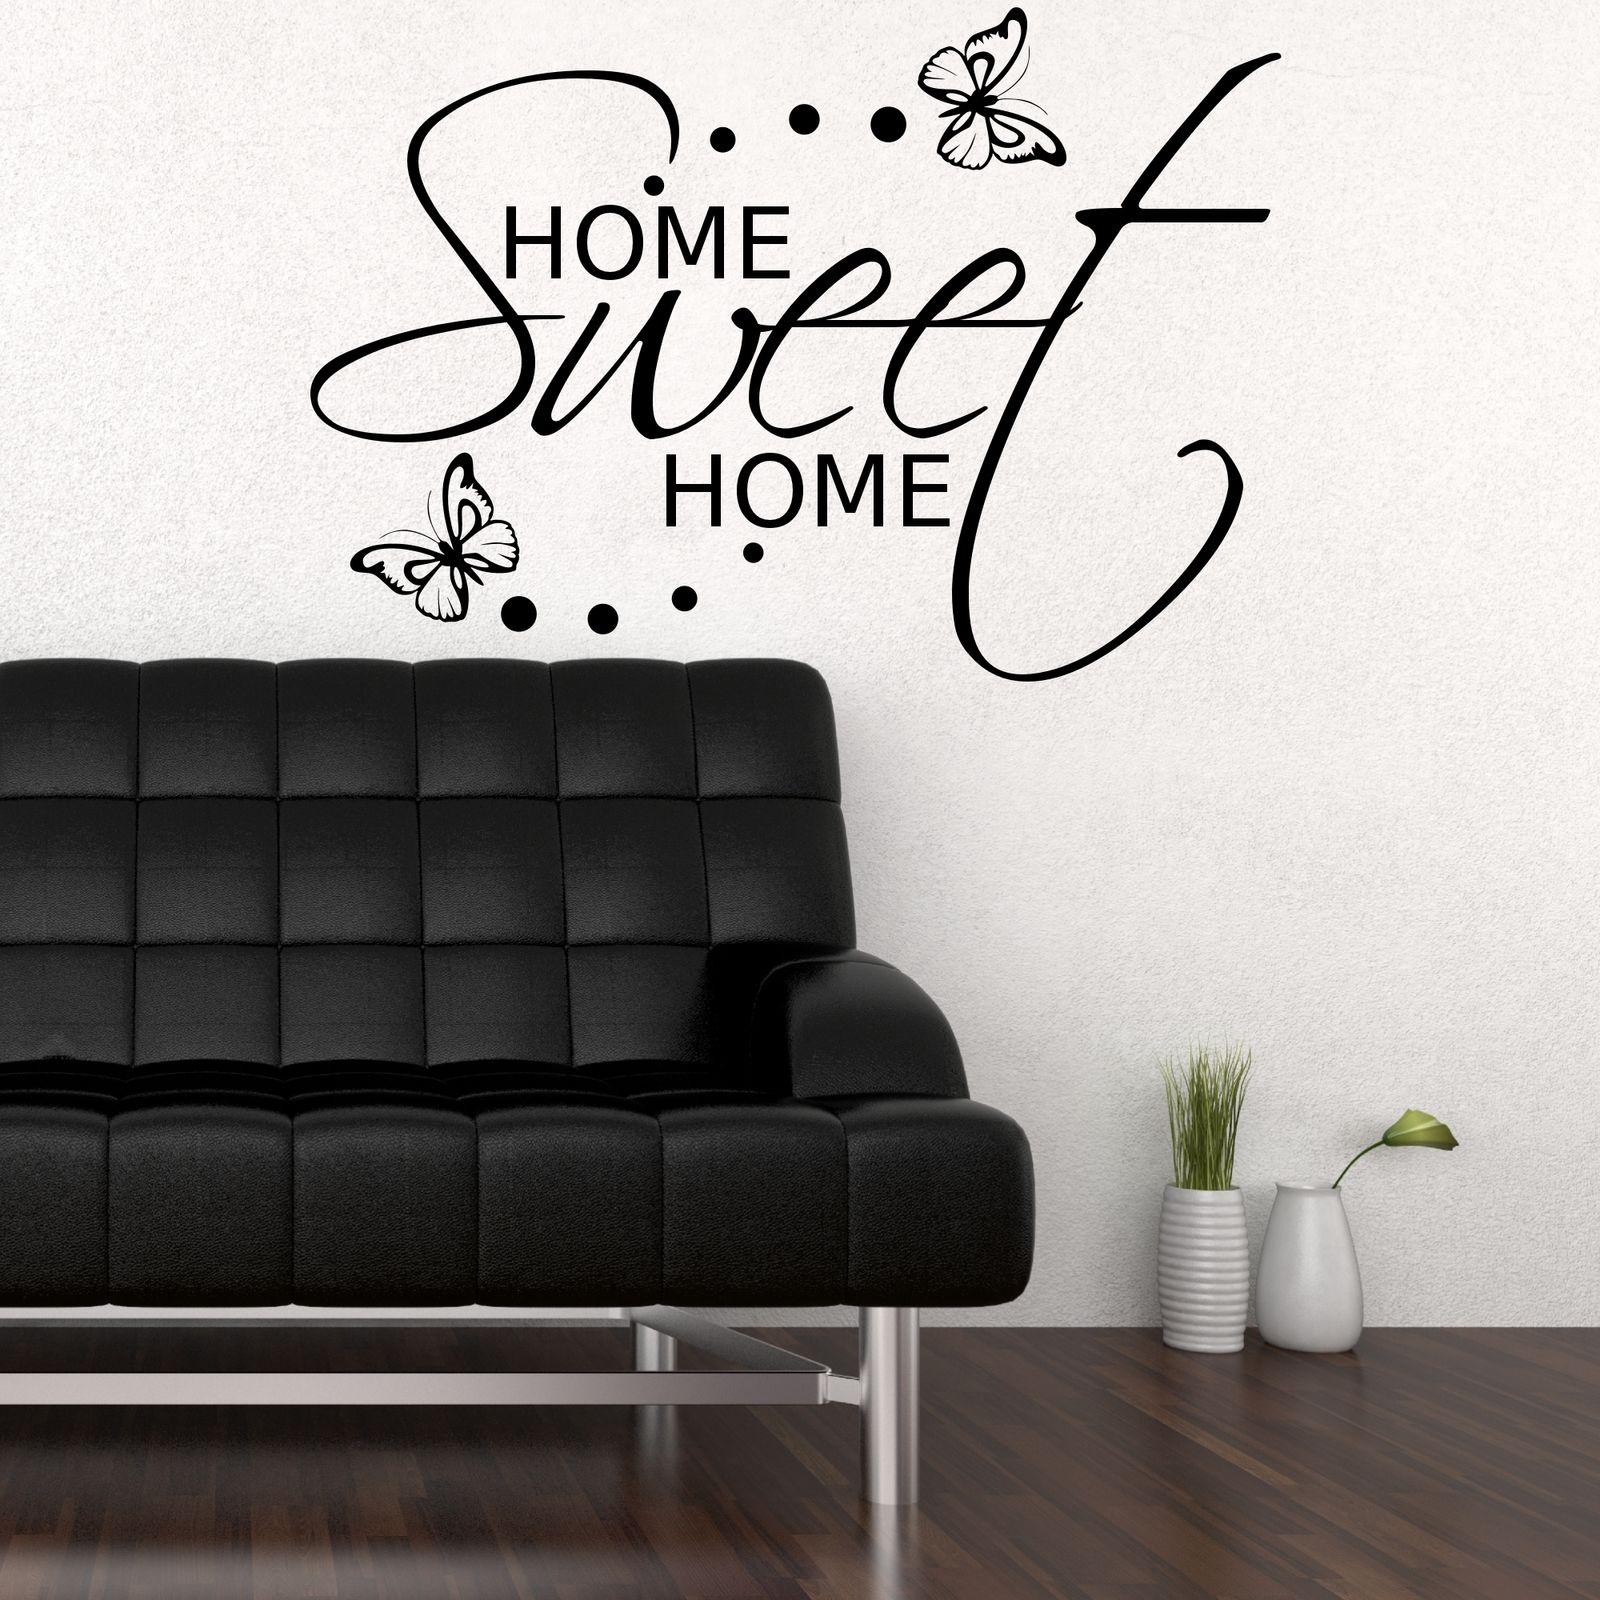 Home Sweet Home Sticker 55cm x 60cm